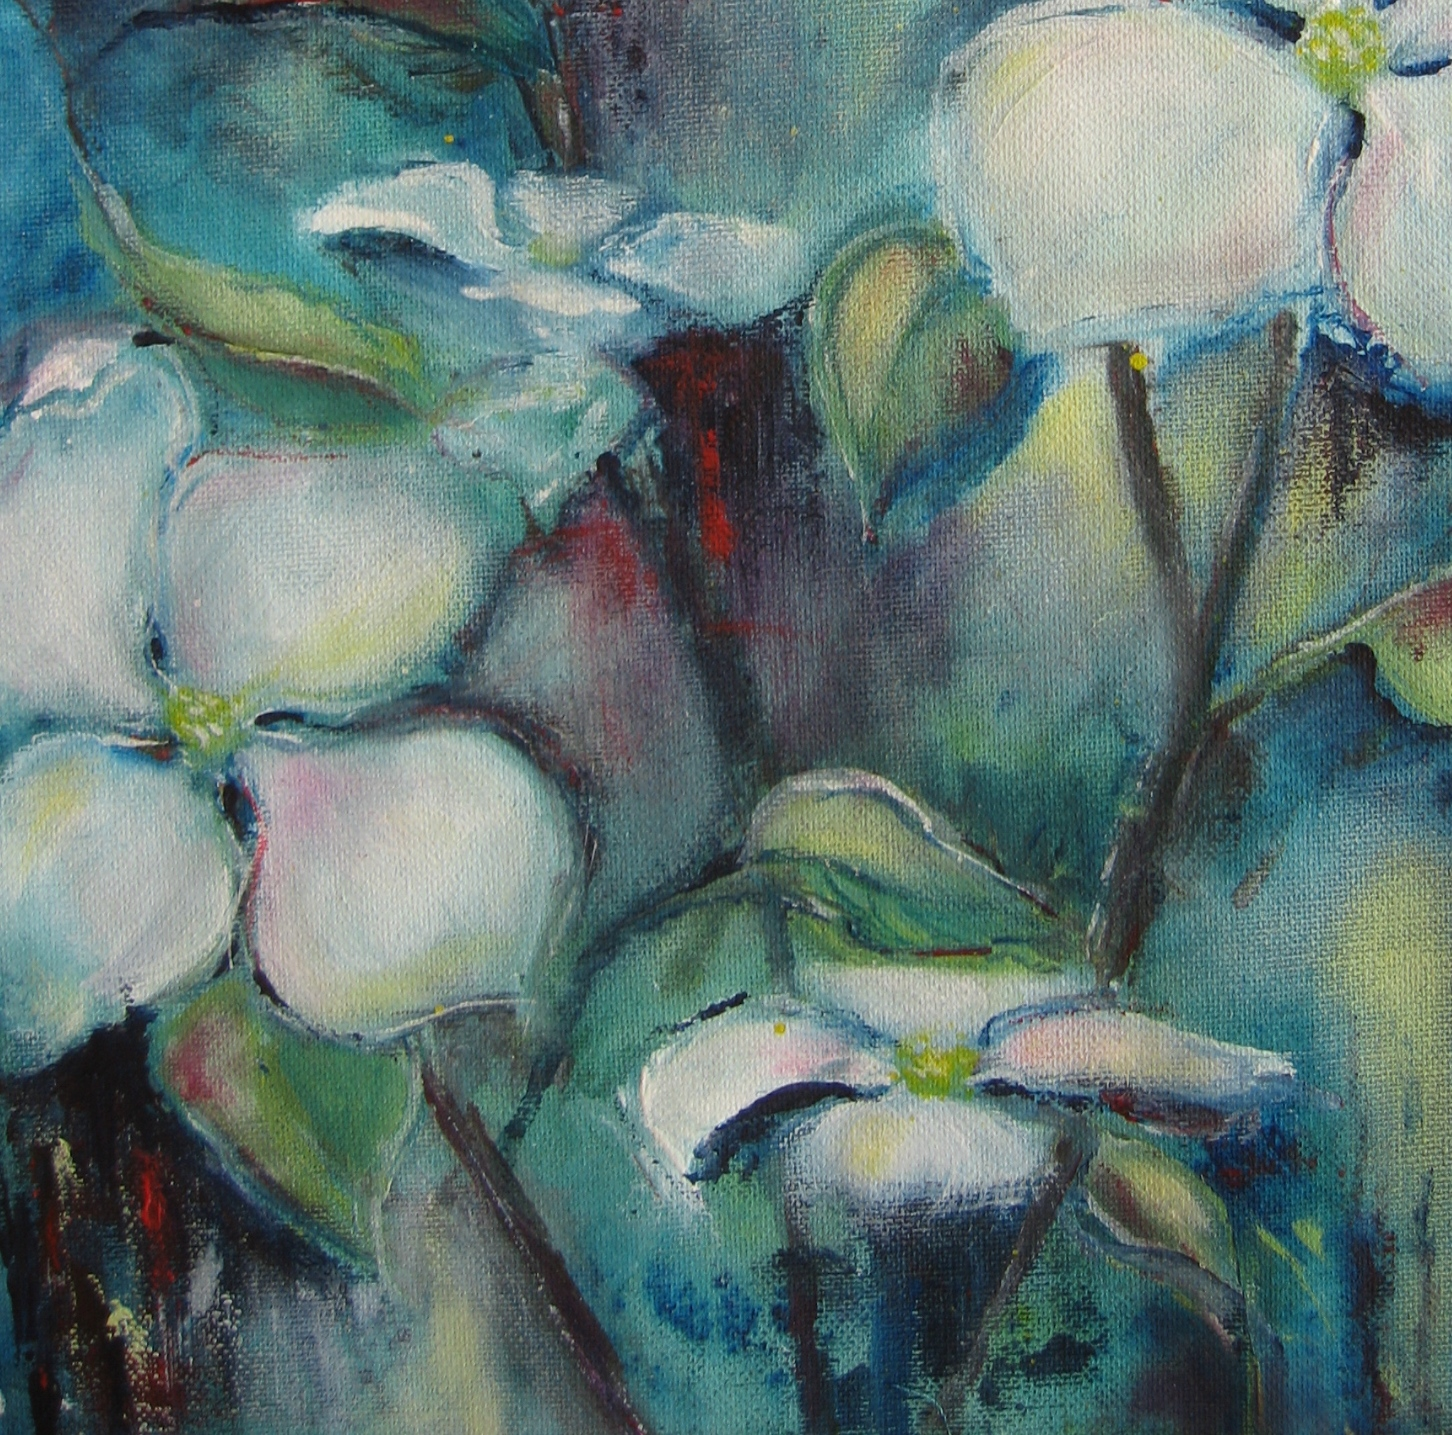 Cornus Venus Blüten II, Acryl, 30 x 30 cm